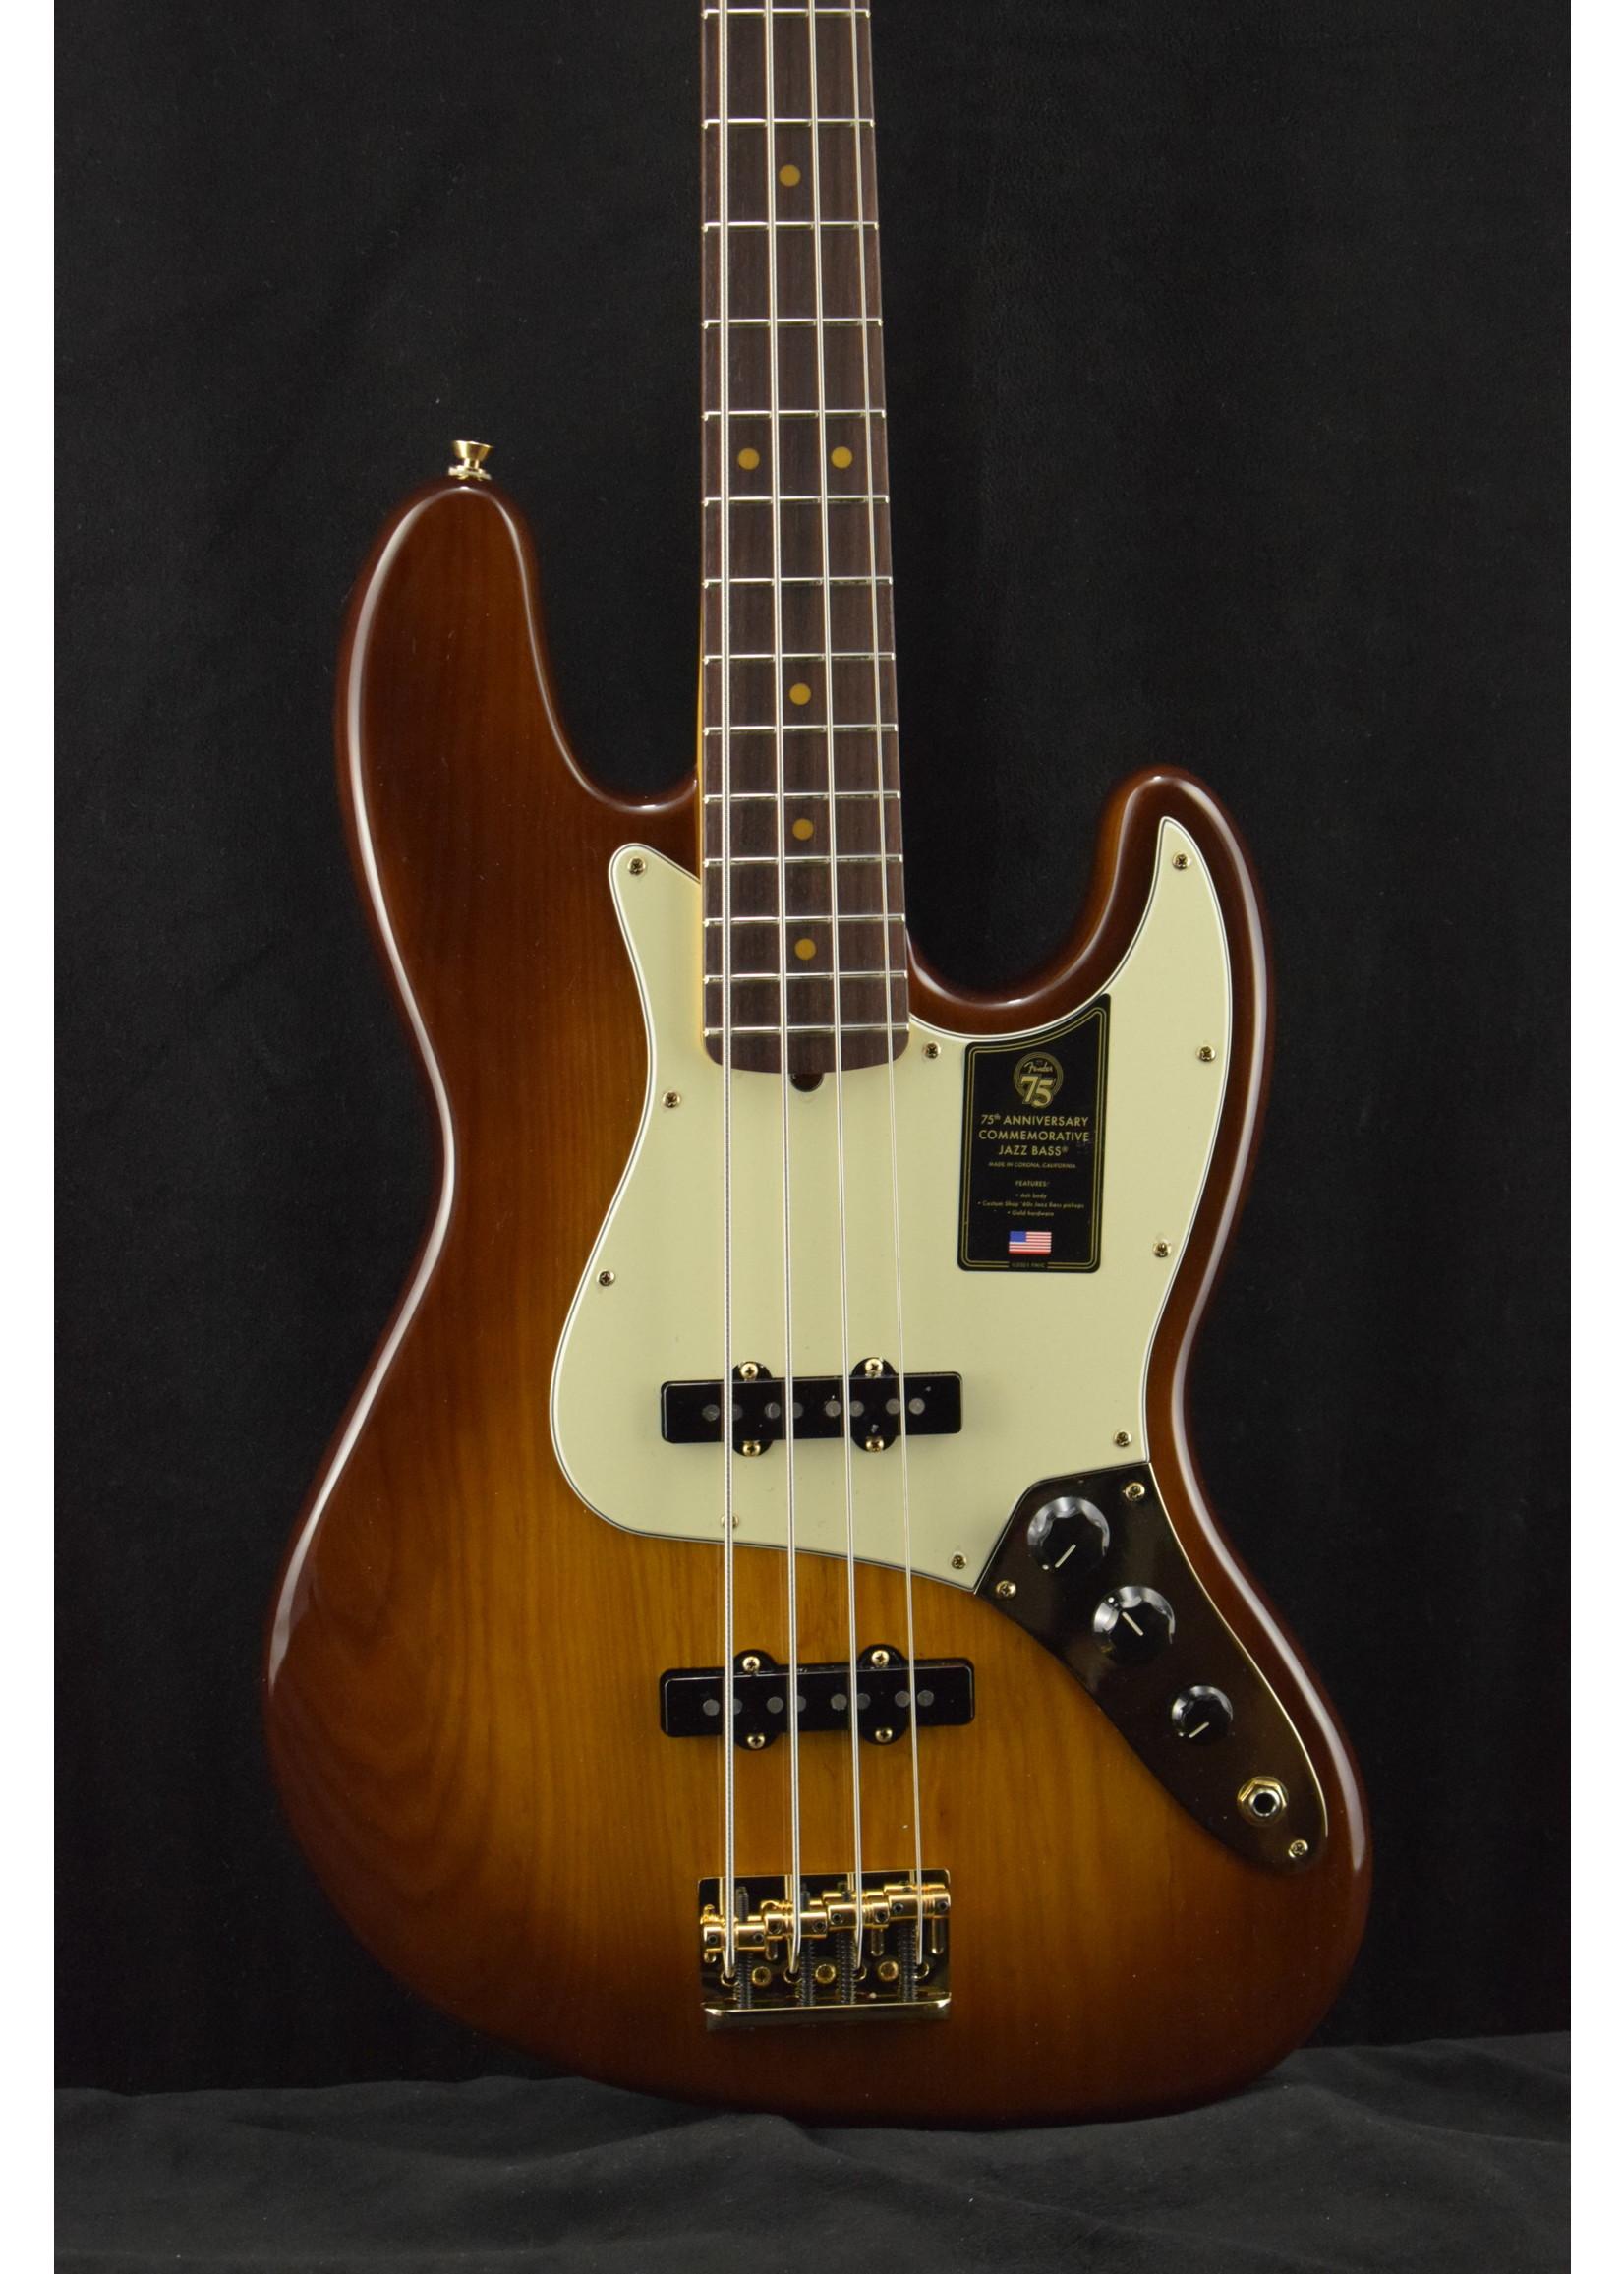 Fender Fender 75th Anniversary Commemorative Jazz Bass 2-Color Bourbon Burst